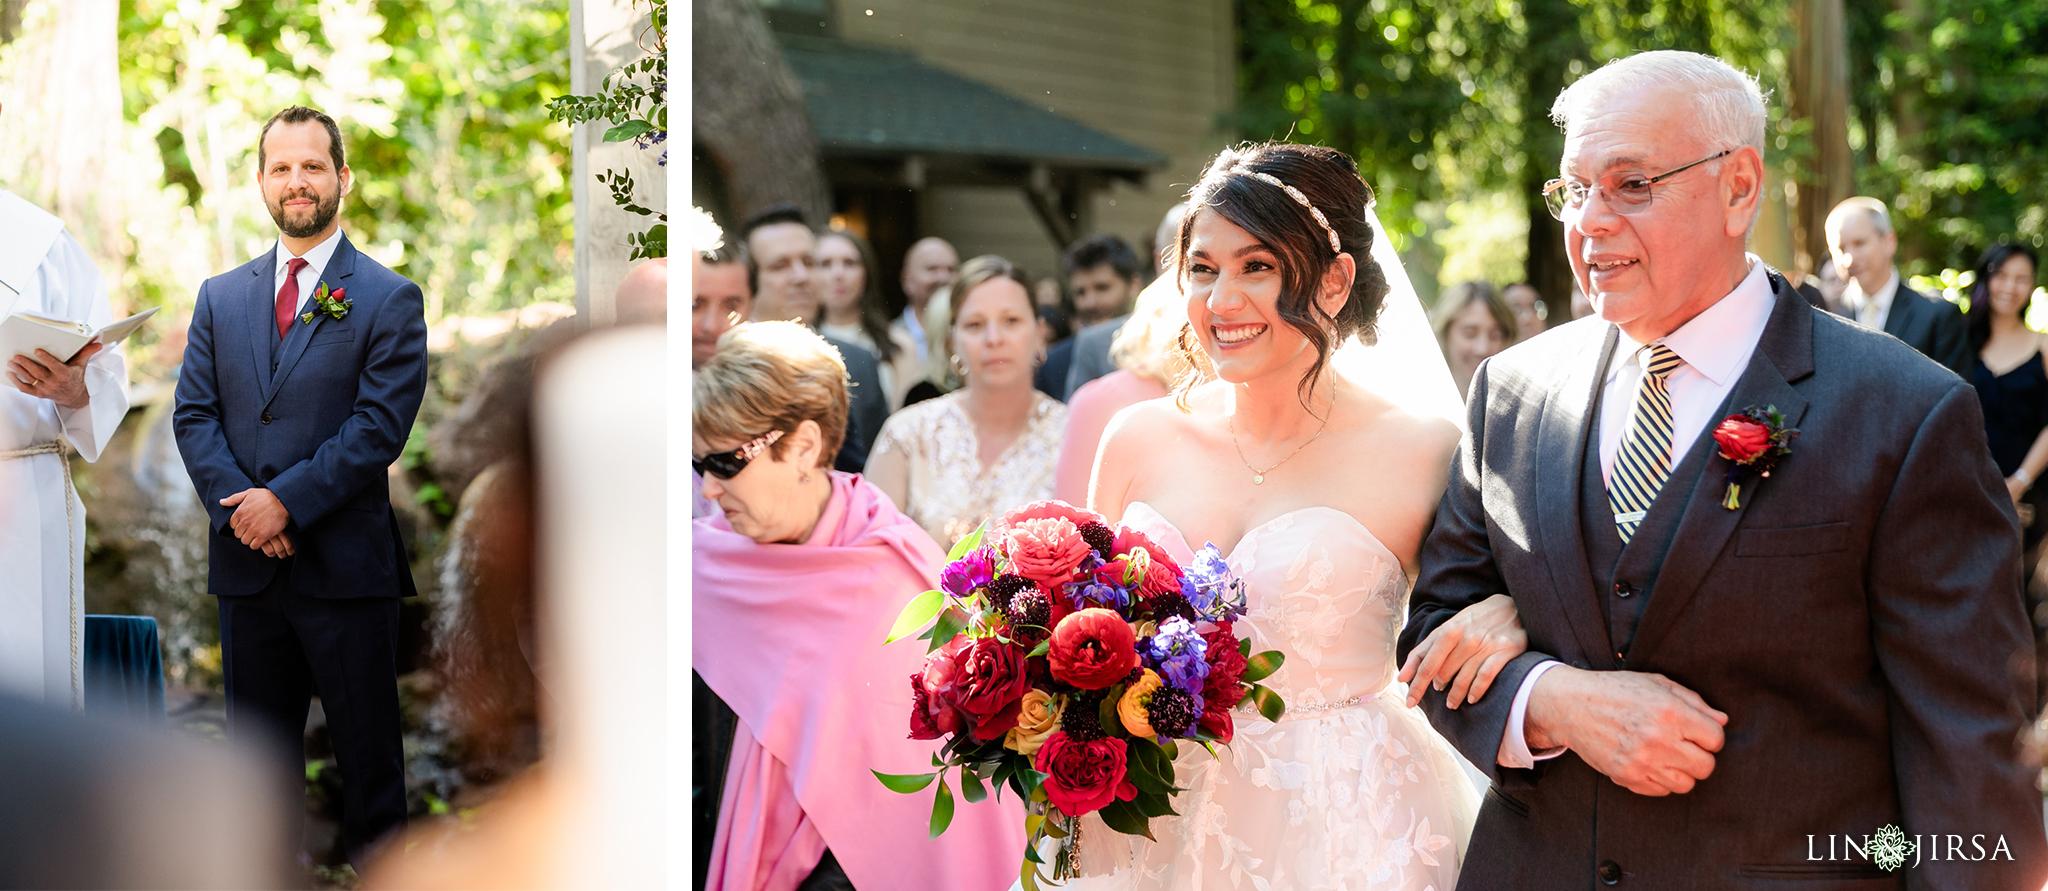 18 Calamigos Rancho Malibu Wedding Photography